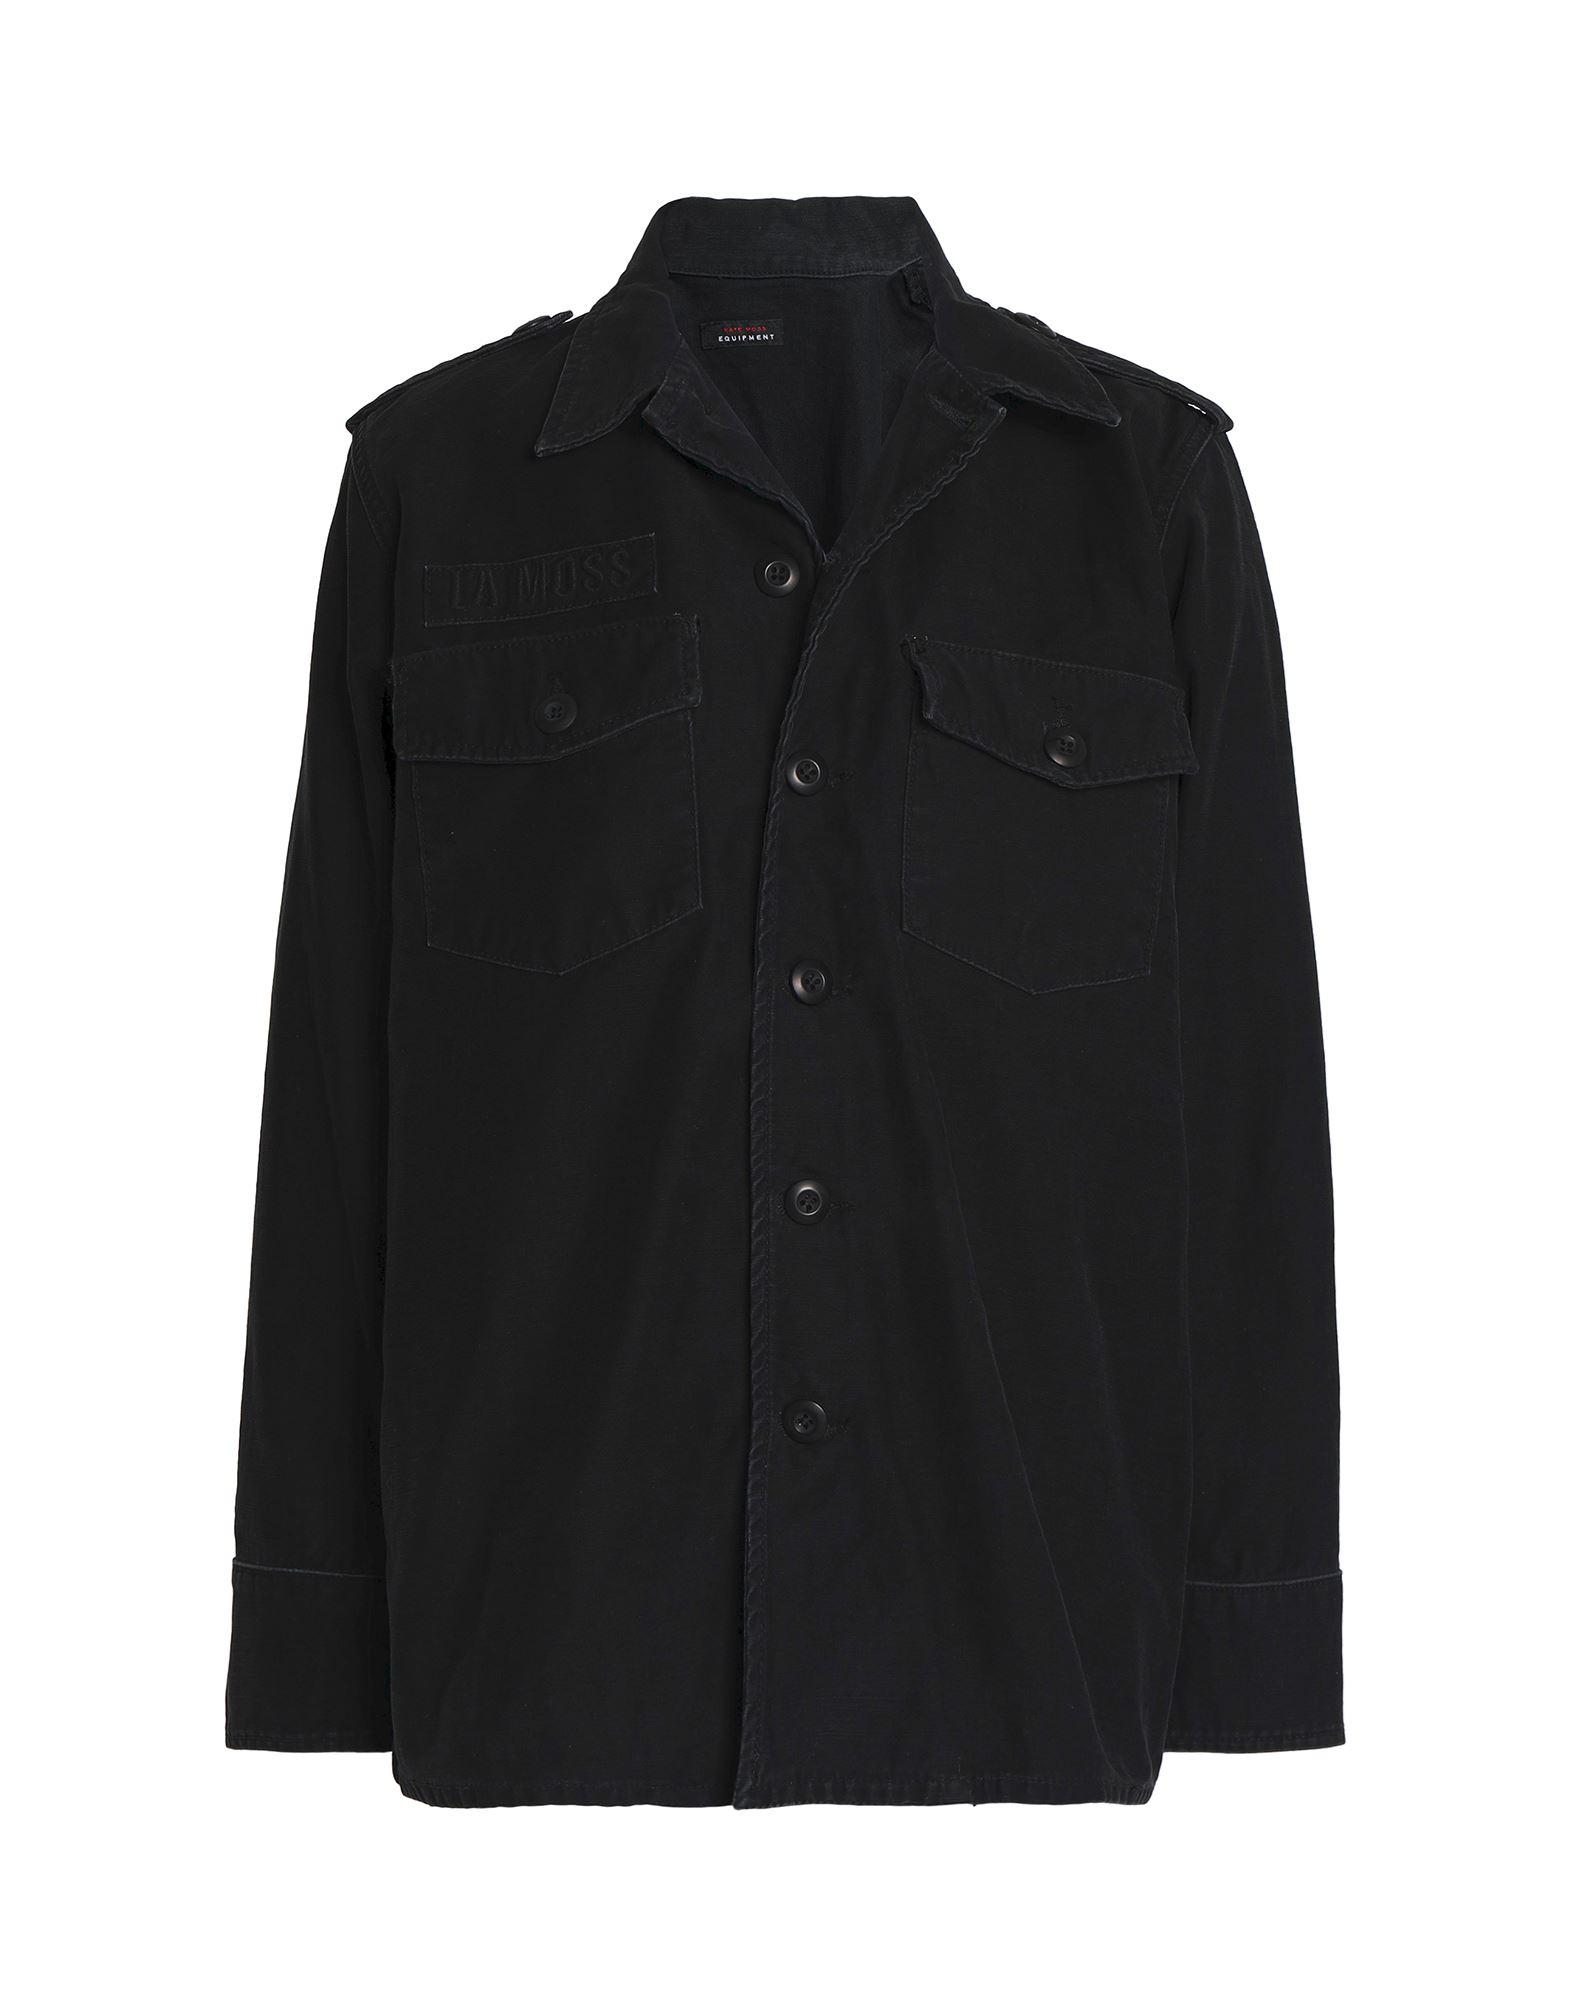 KATE MOSS EQUIPMENT Jacket in Black